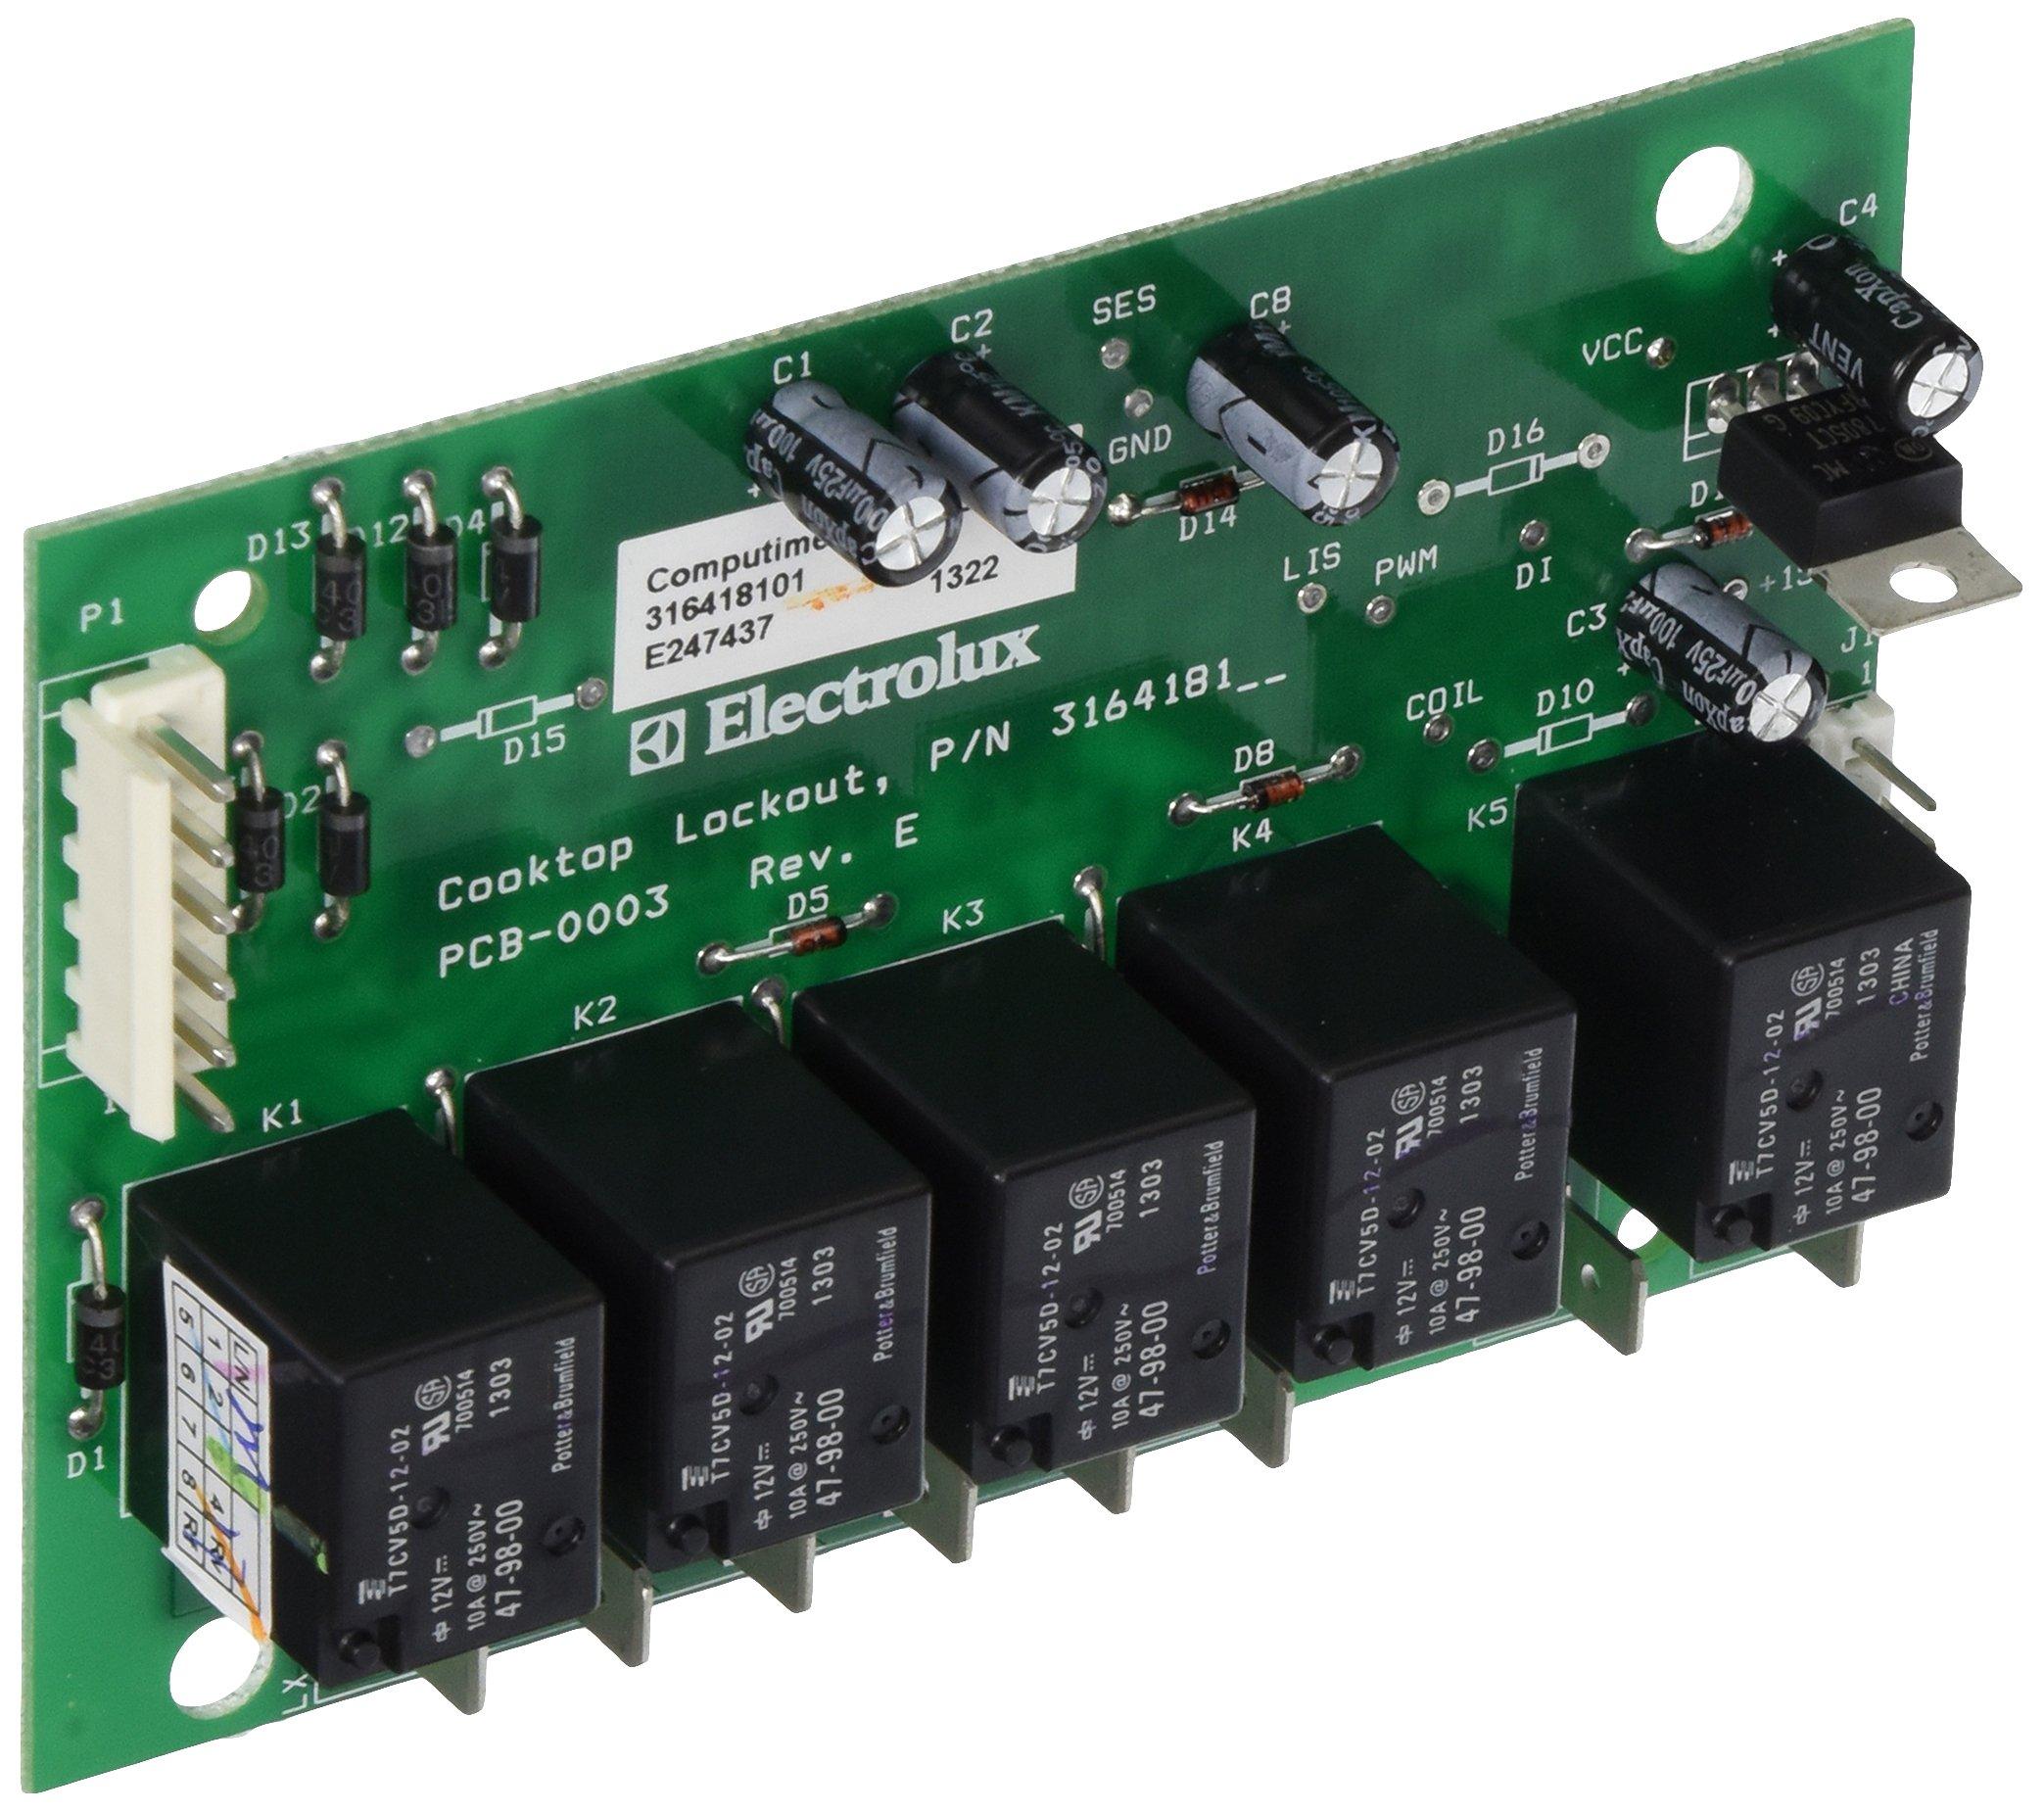 Frigidaire 316418101 Relay Board Range/Stove/Oven